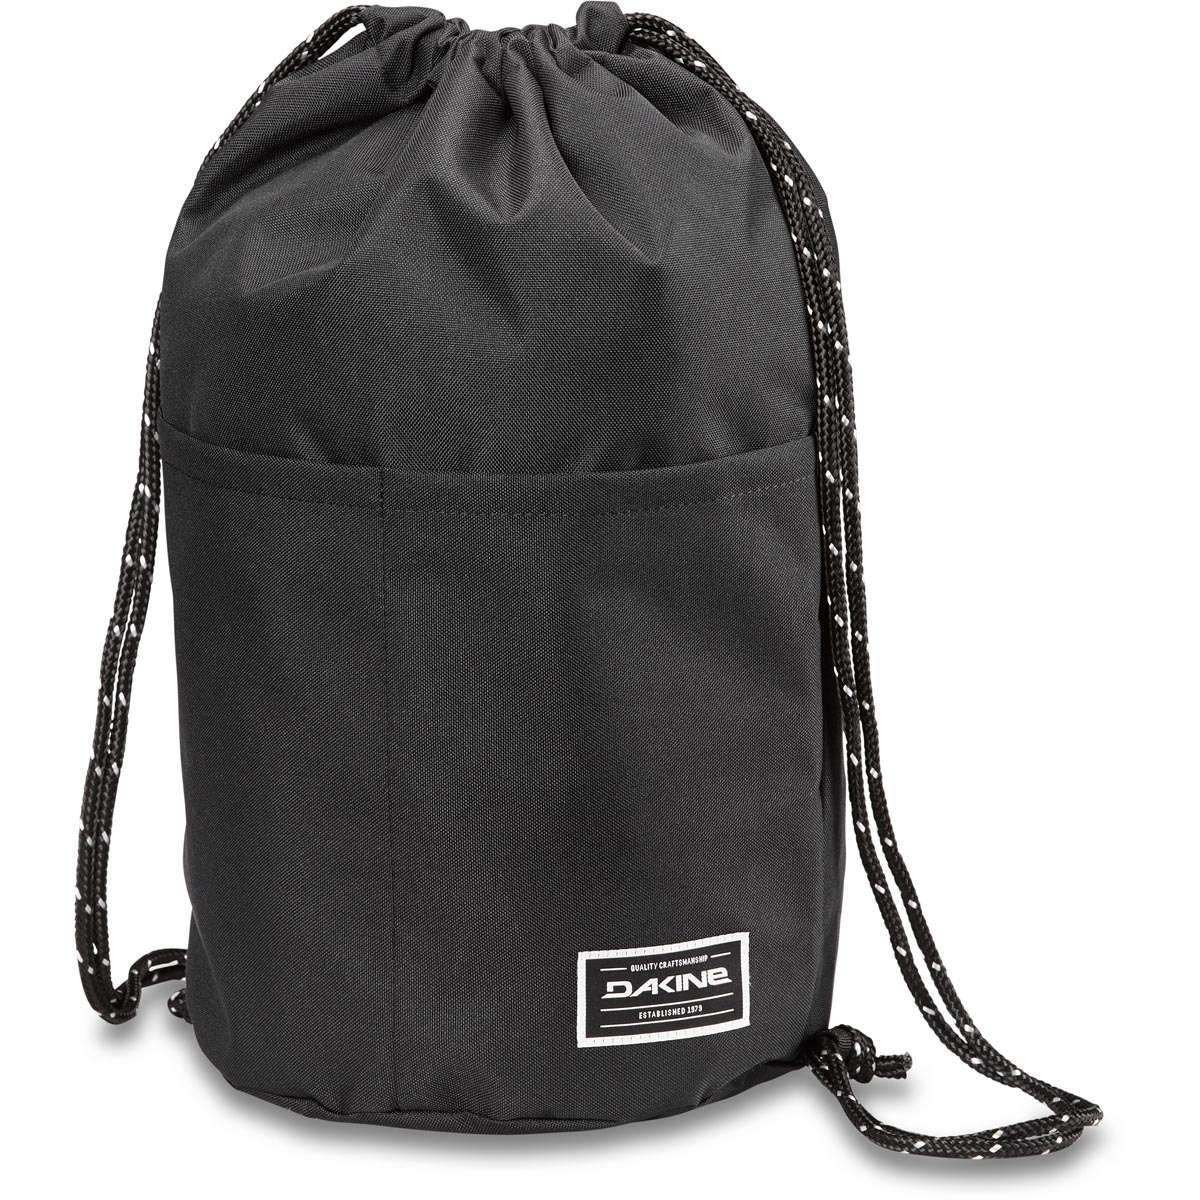 fb4a44a334ef3 Dakine Cinch Pack 17L Backpack Black